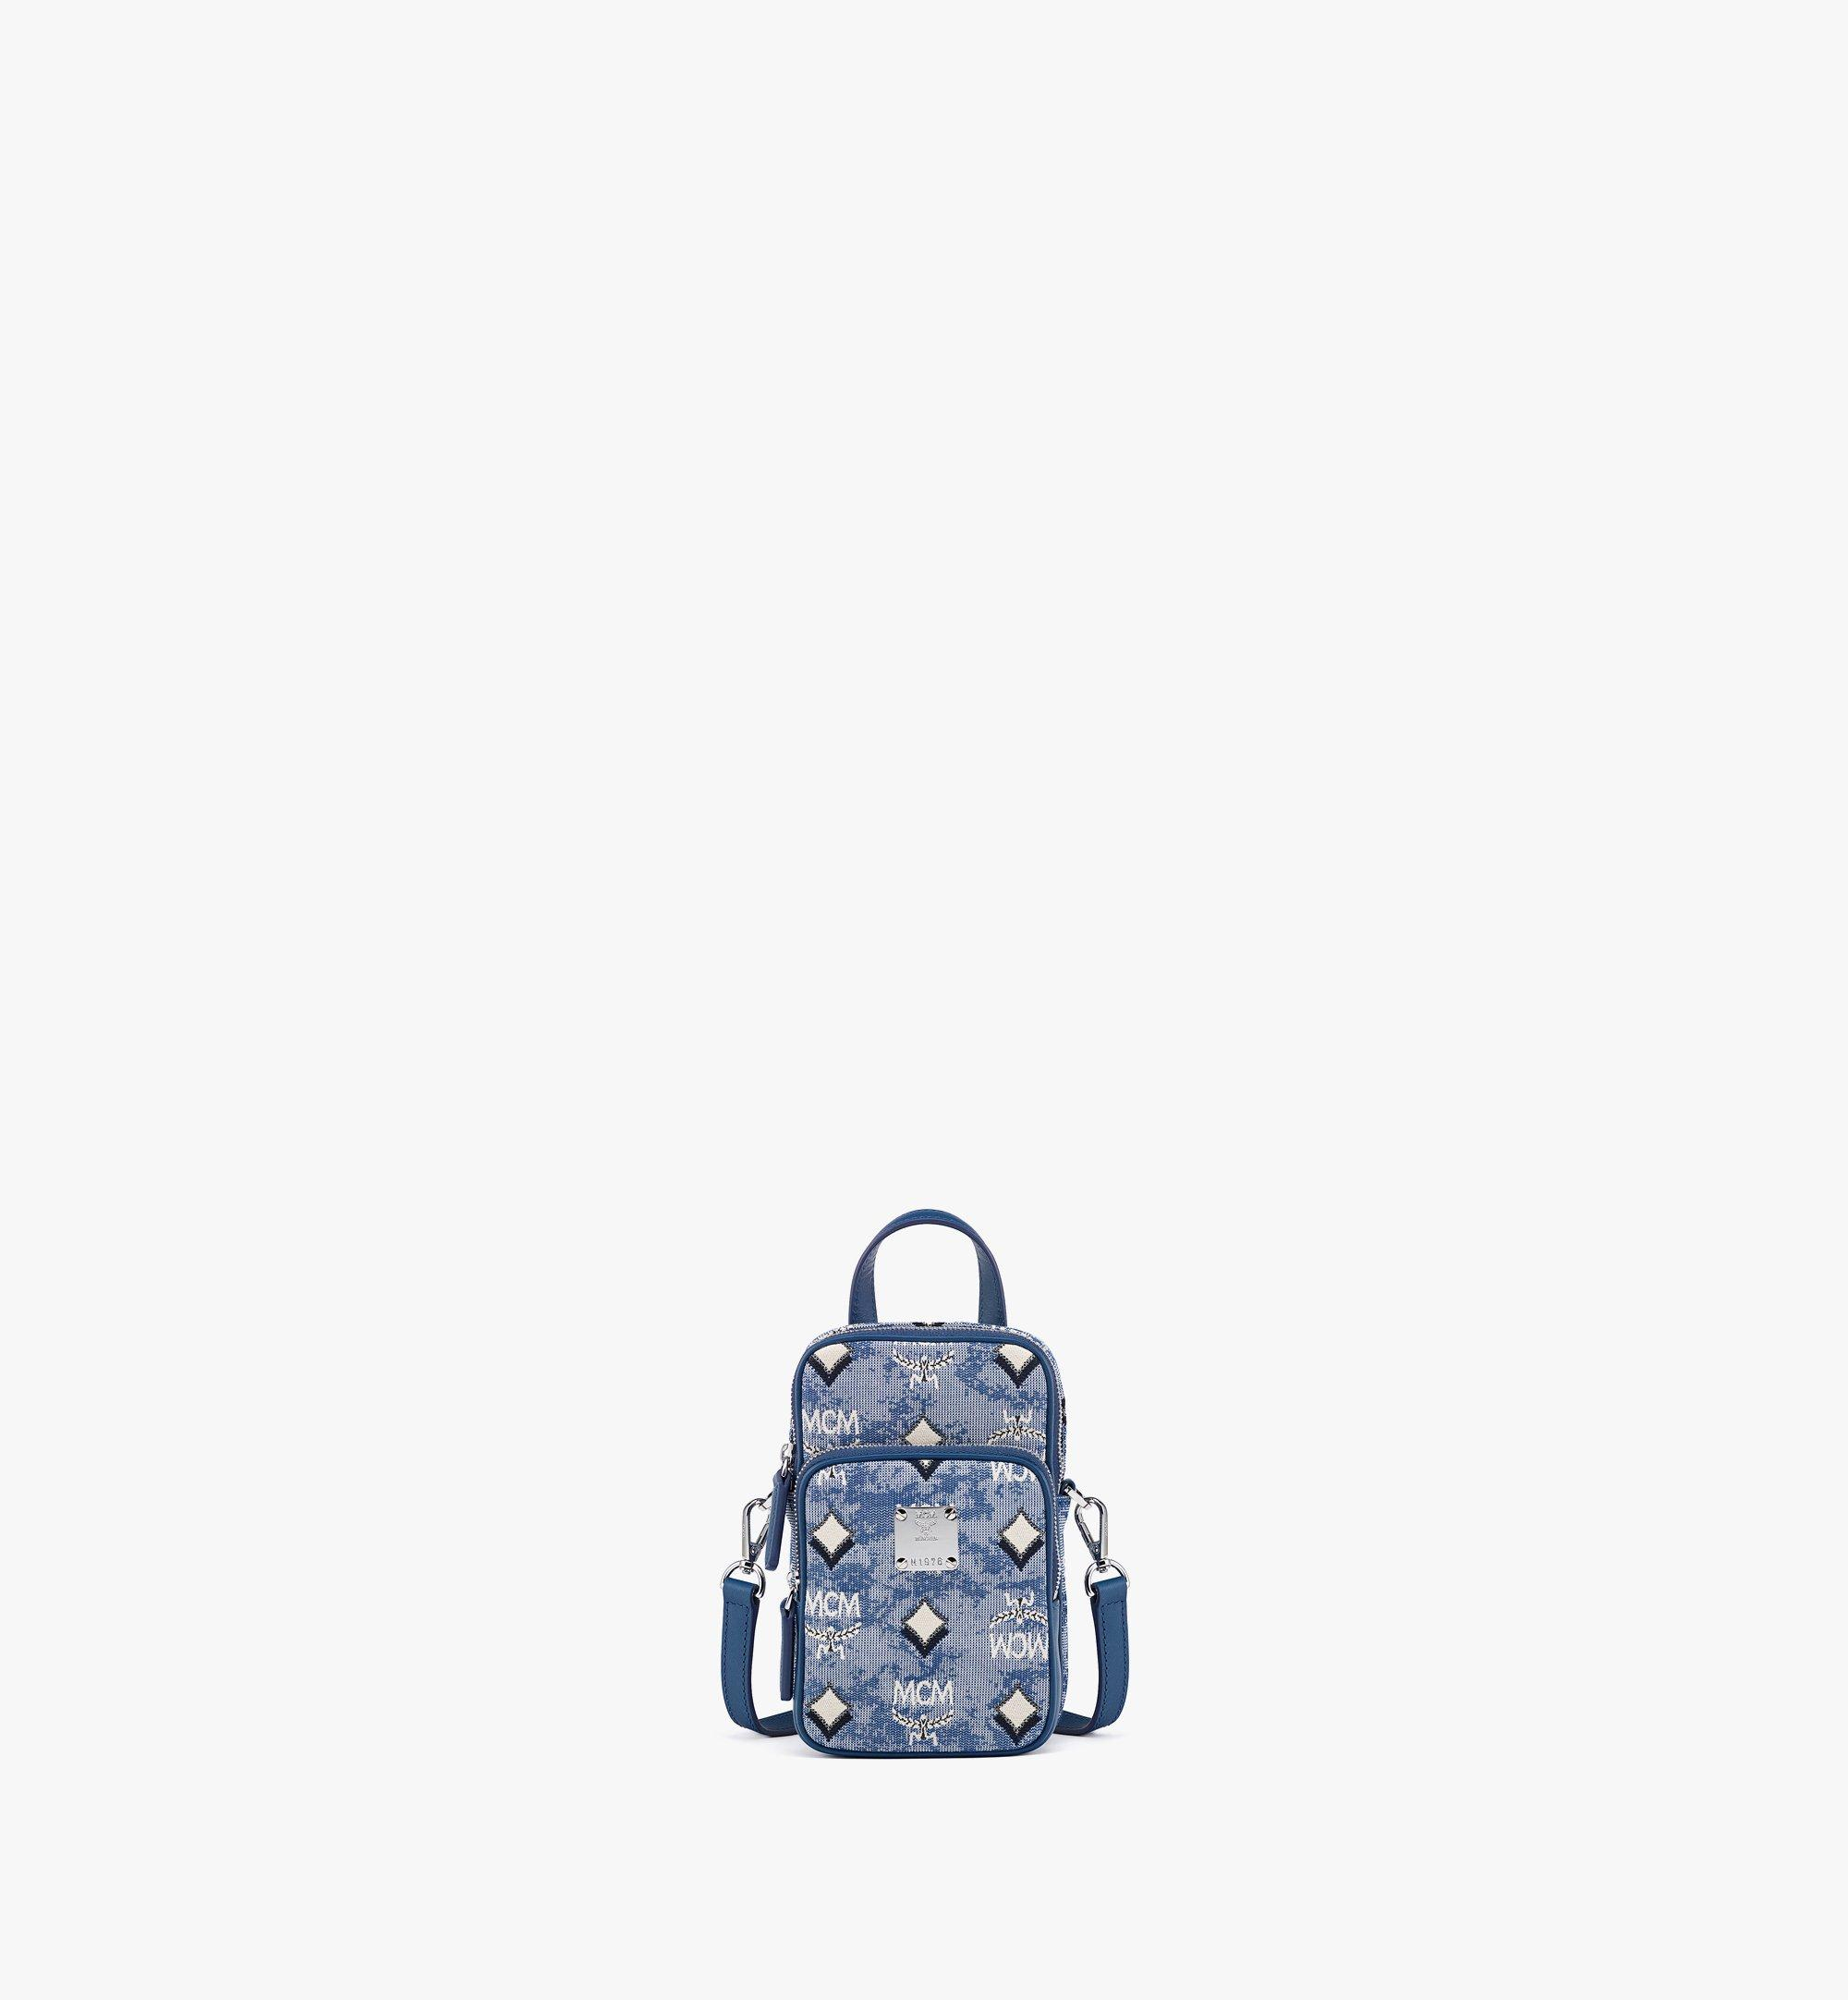 MCM N/S Crossbody Bag in Vintage Jacquard Monogram Blue MMRBATQ02LU001 Alternate View 1